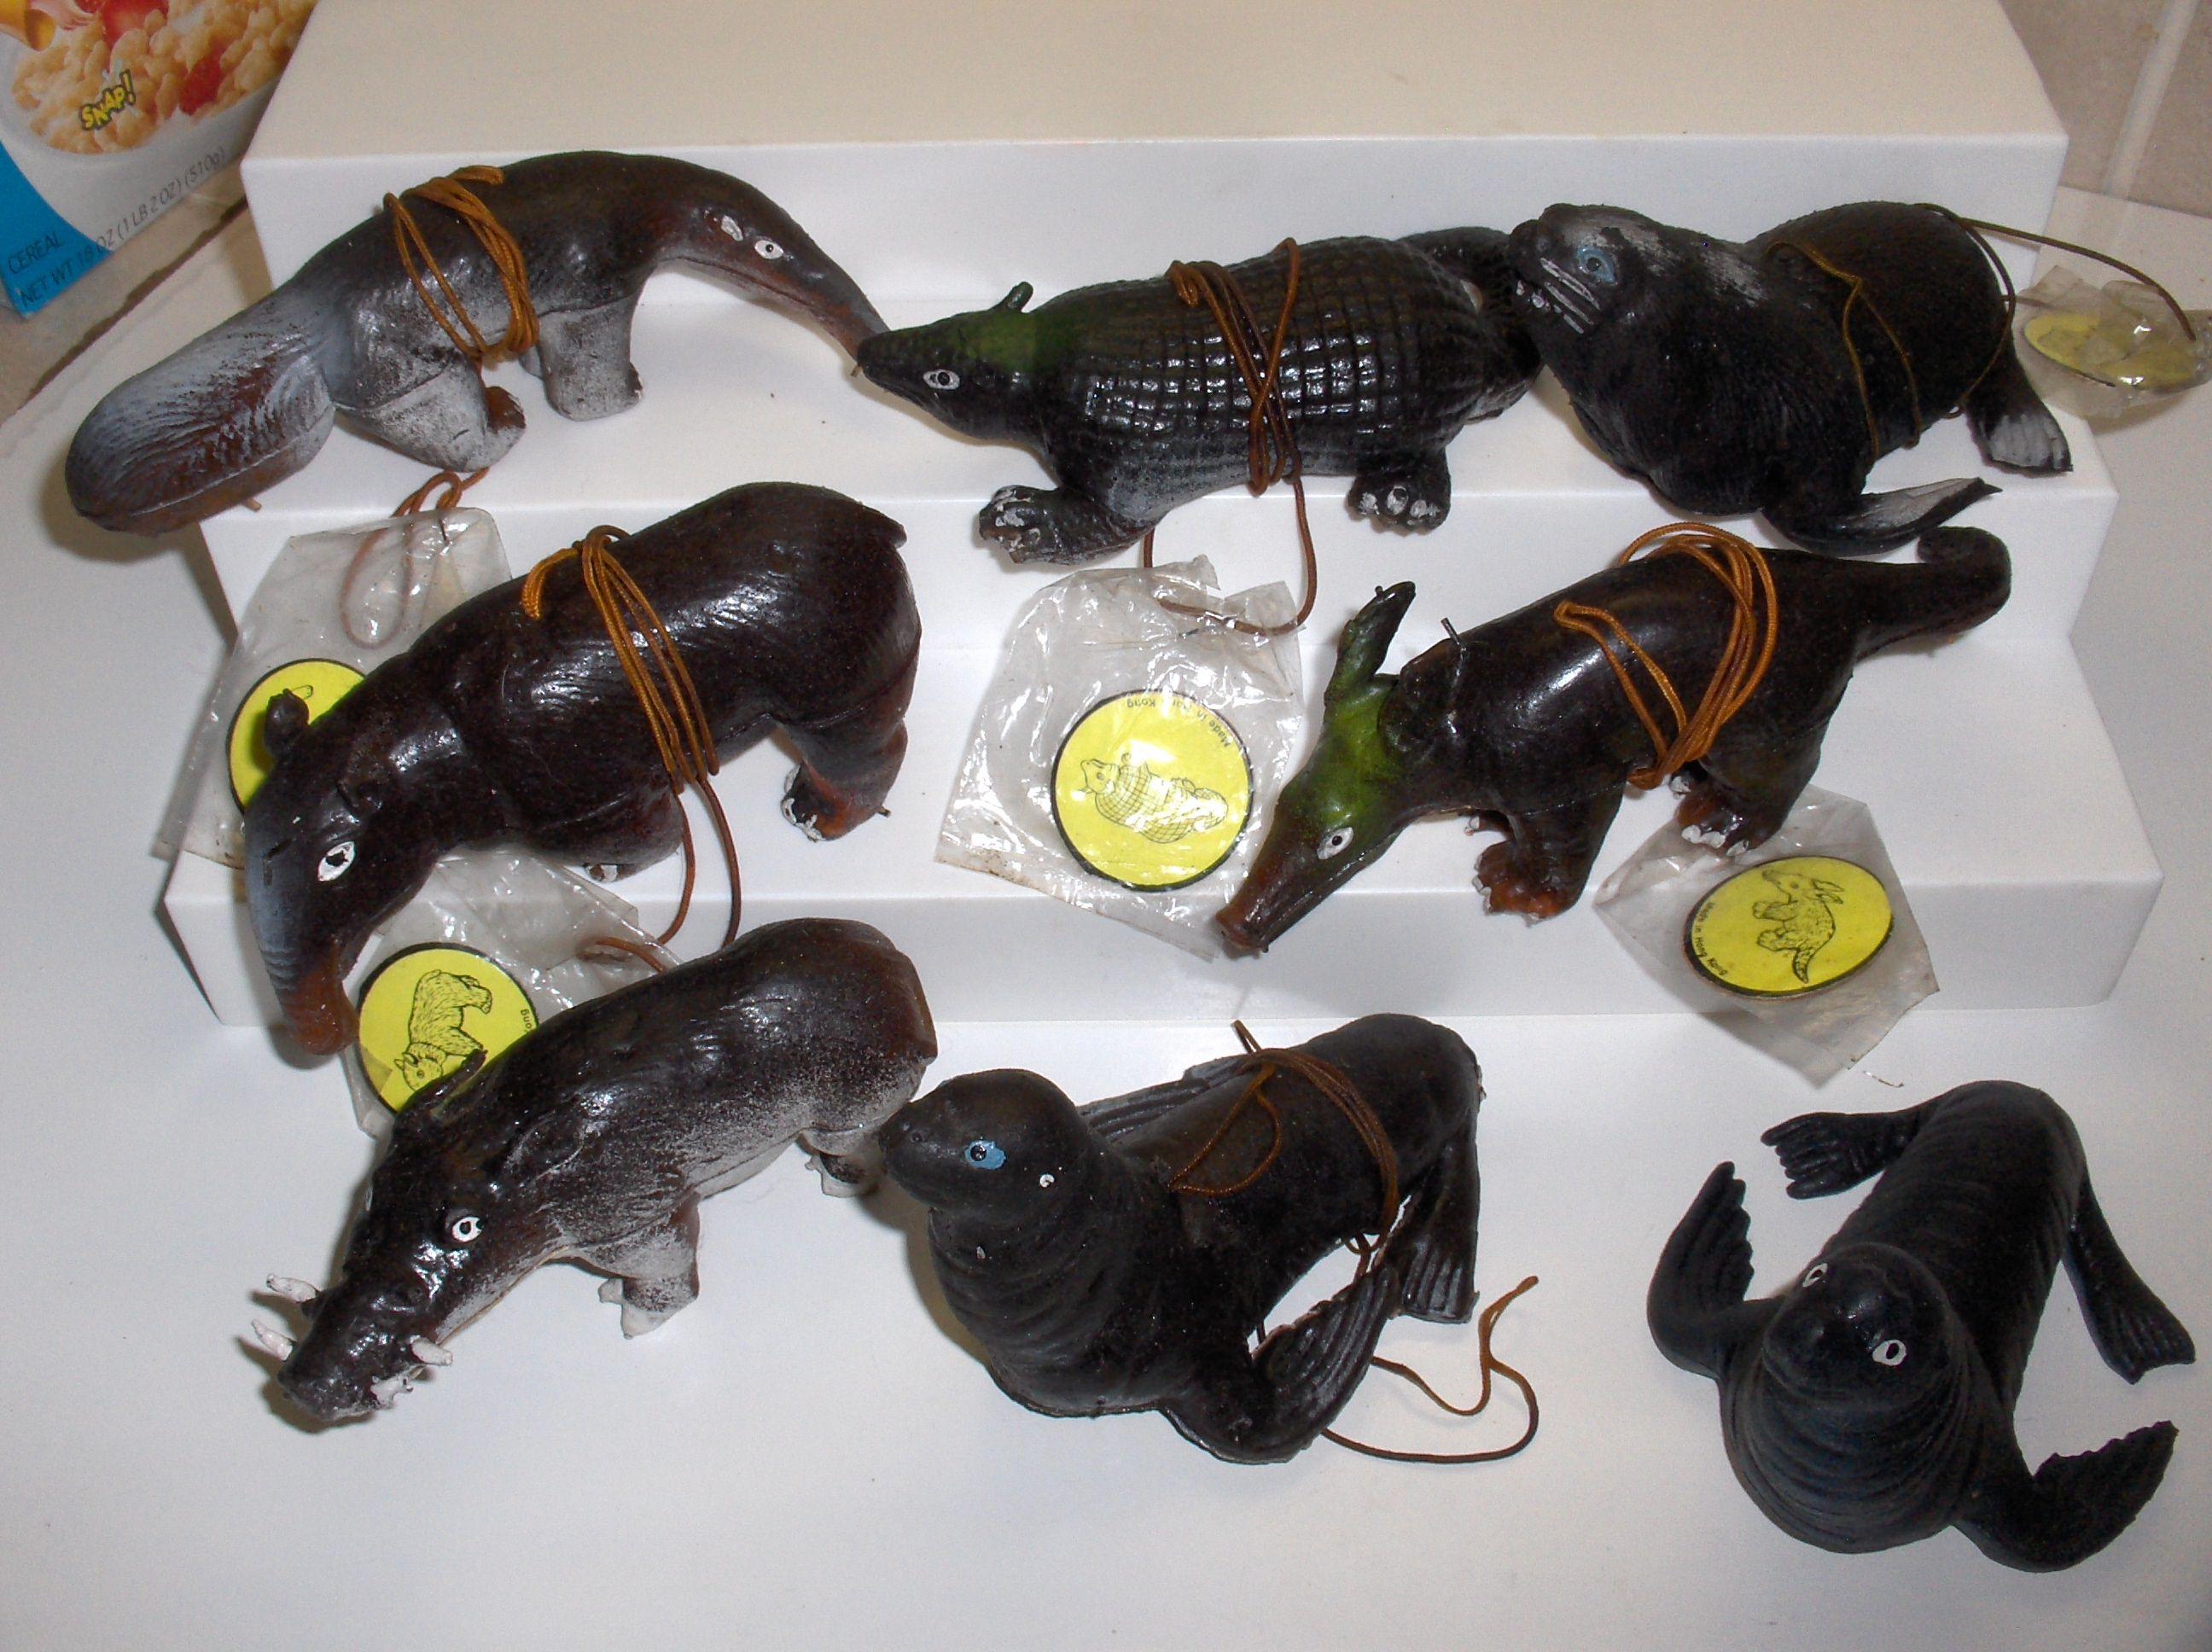 1960 toys images  Oily Animals  Rubber Jiggler Toys  Pinterest